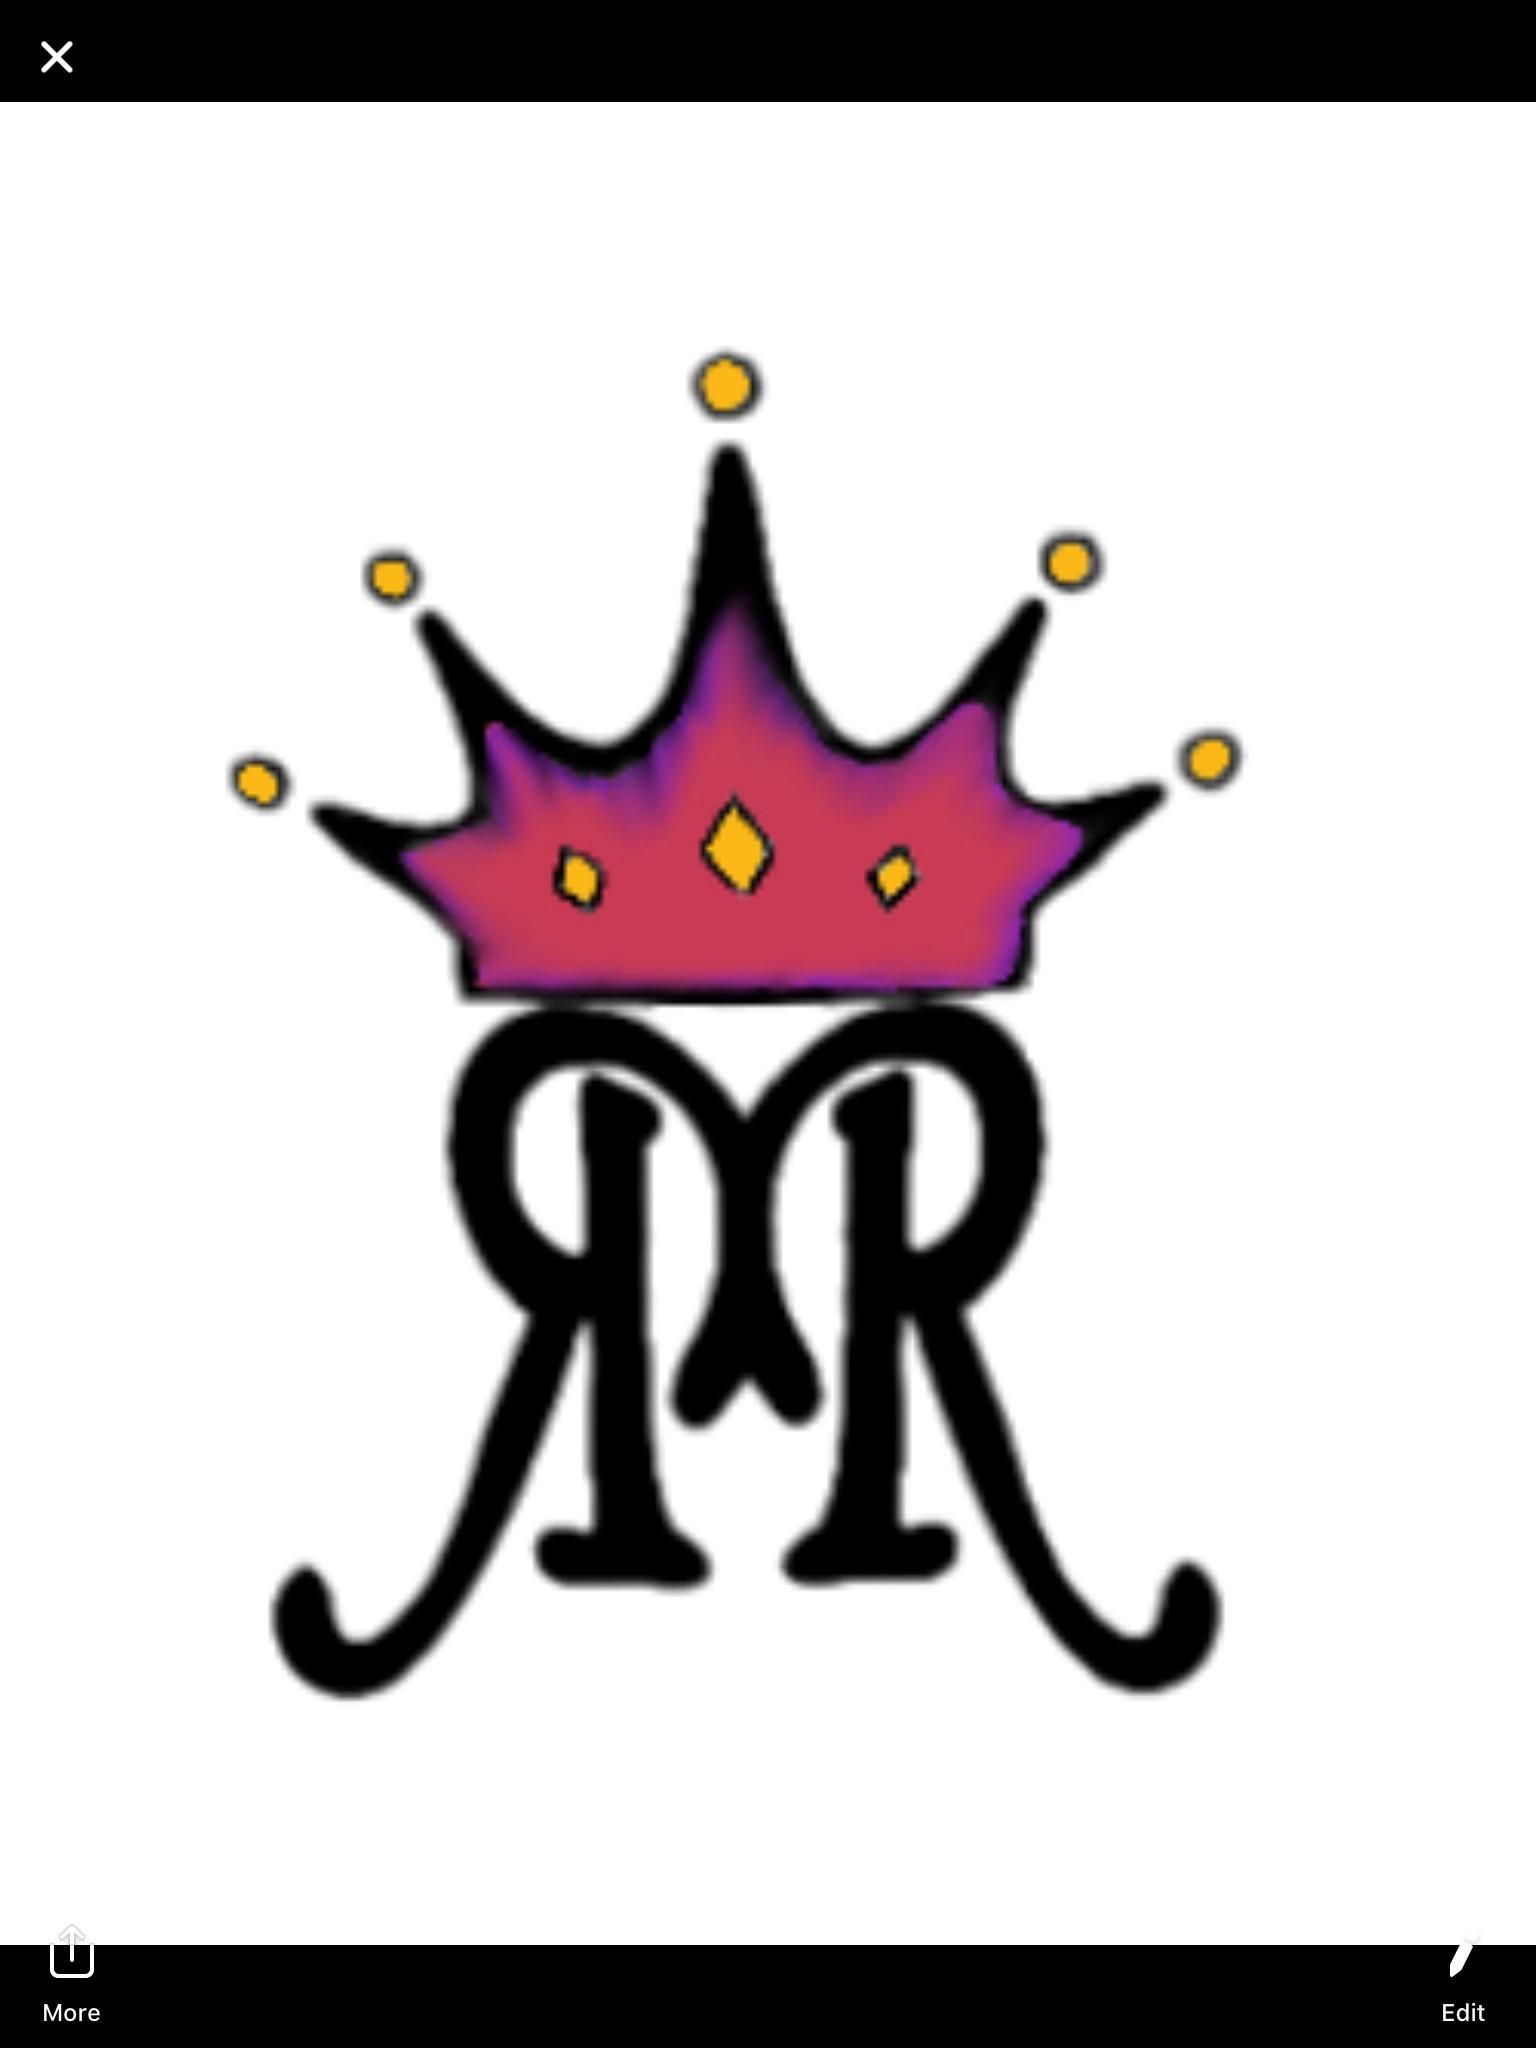 Ragalia Ragz